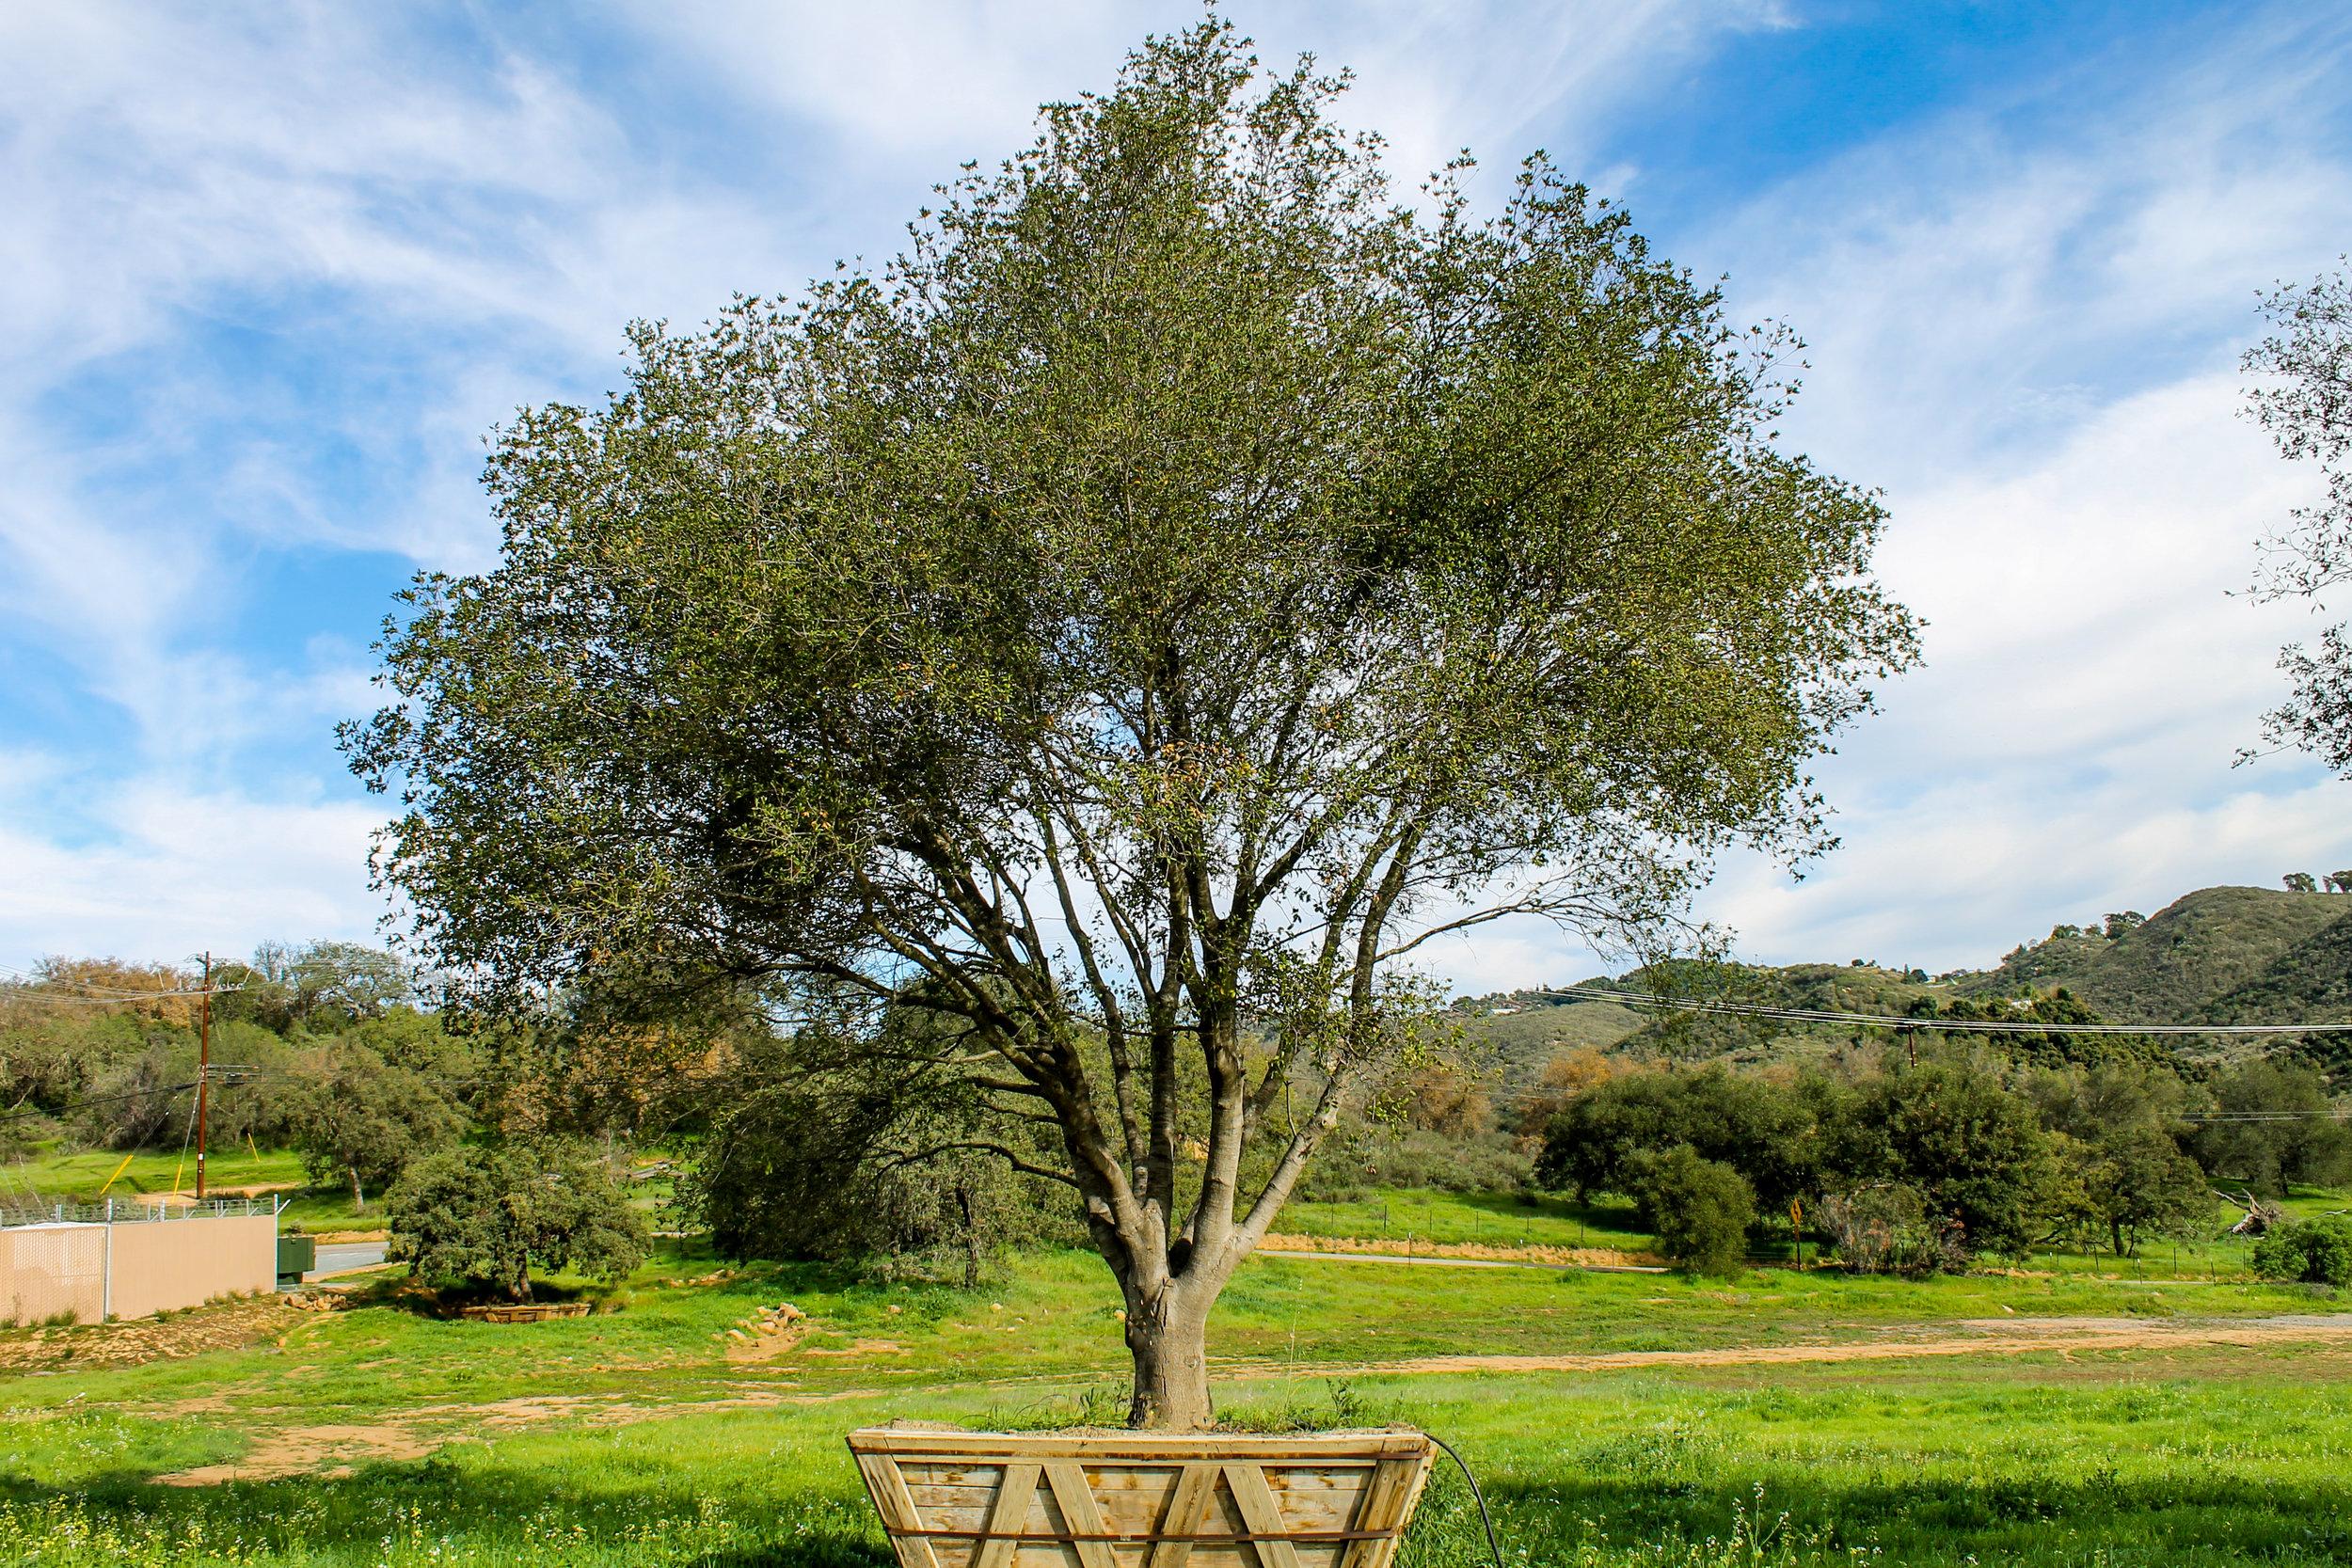 Quercus agrifolia 132 box - RL 1 - Available as 03-16 (1).jpg